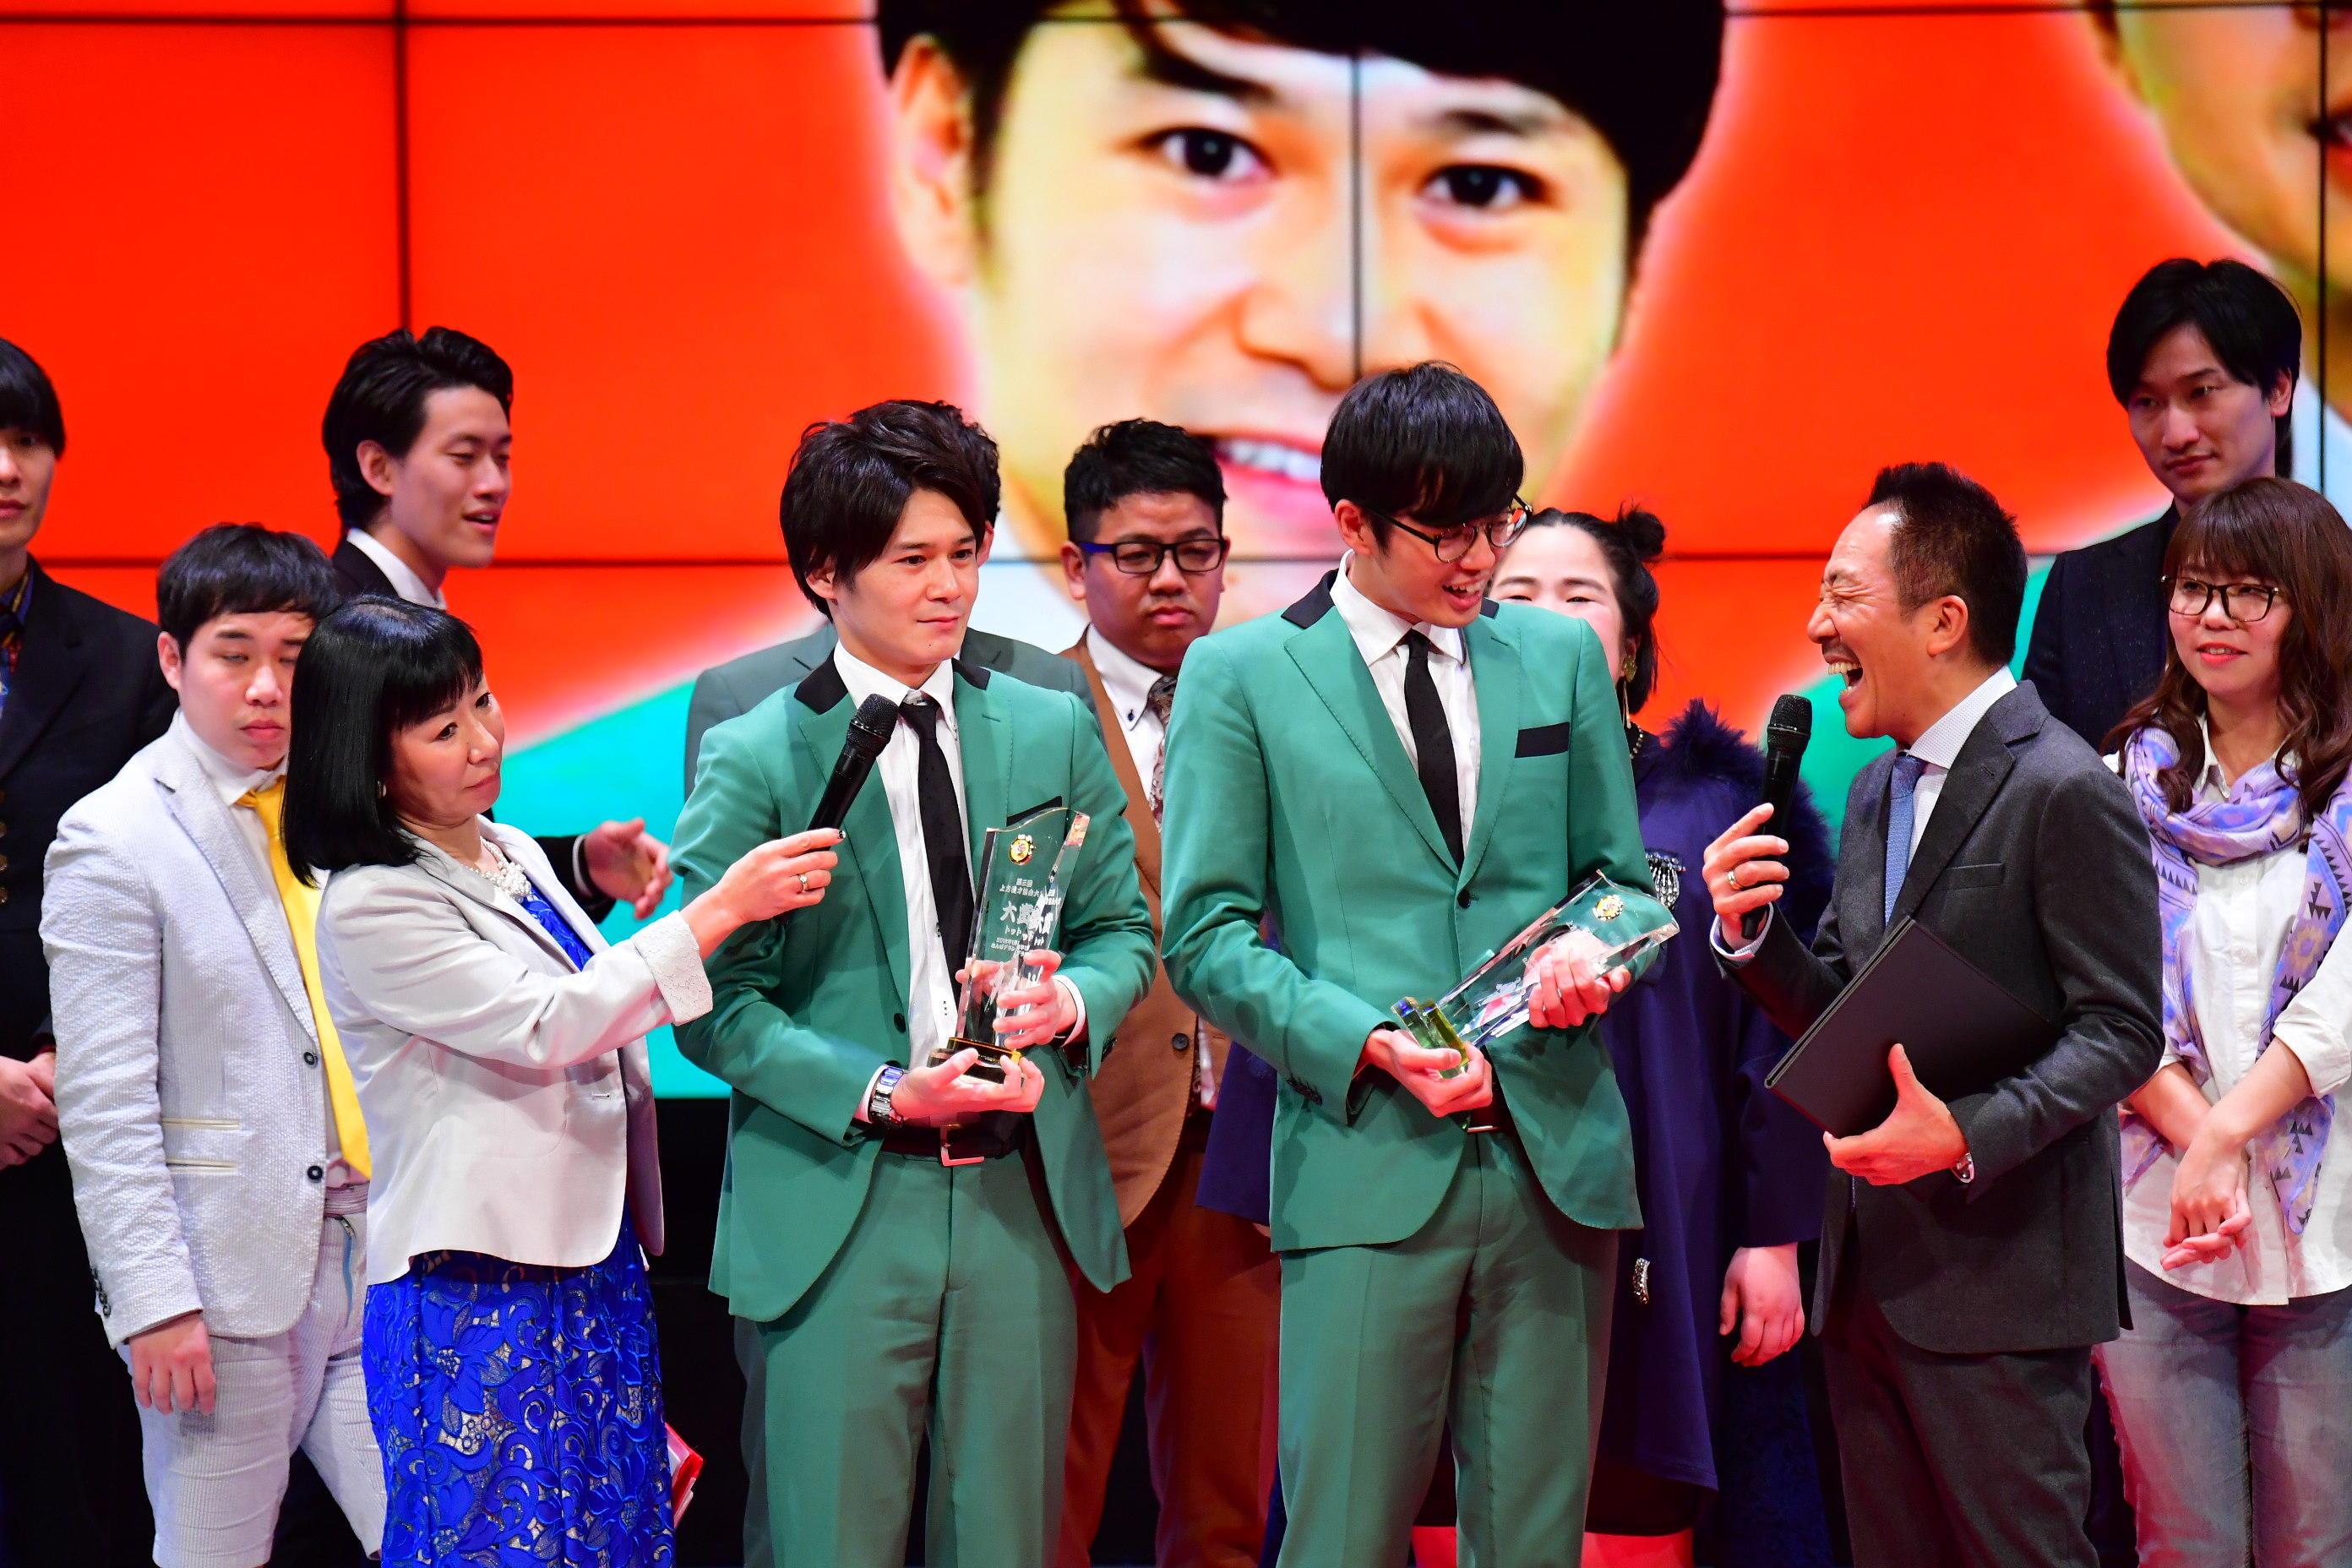 http://news.yoshimoto.co.jp/20180109020550-9bc878d55b2ea01453f6aa4e4f8b438421bcc24c.jpg